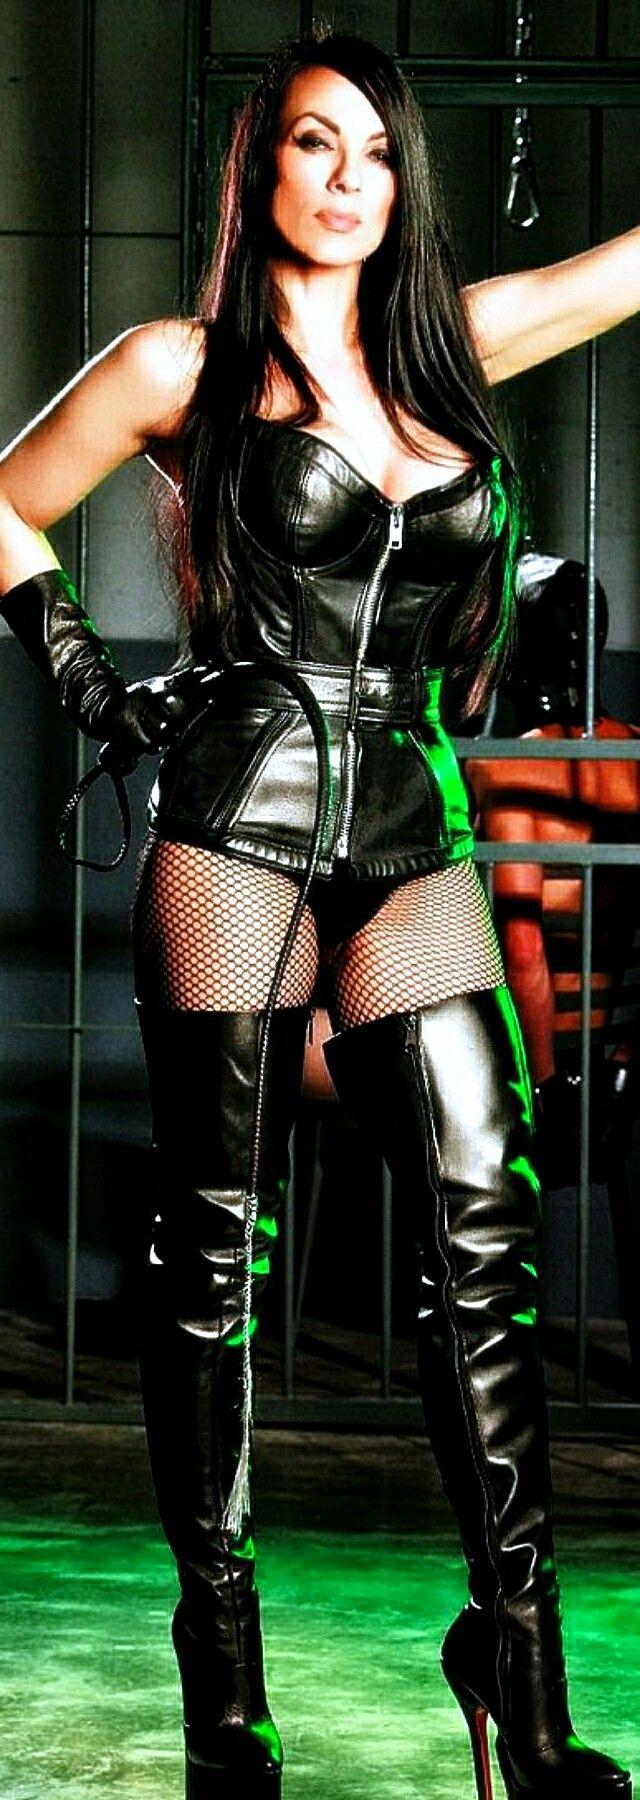 Dominatrixes leather fetish wear